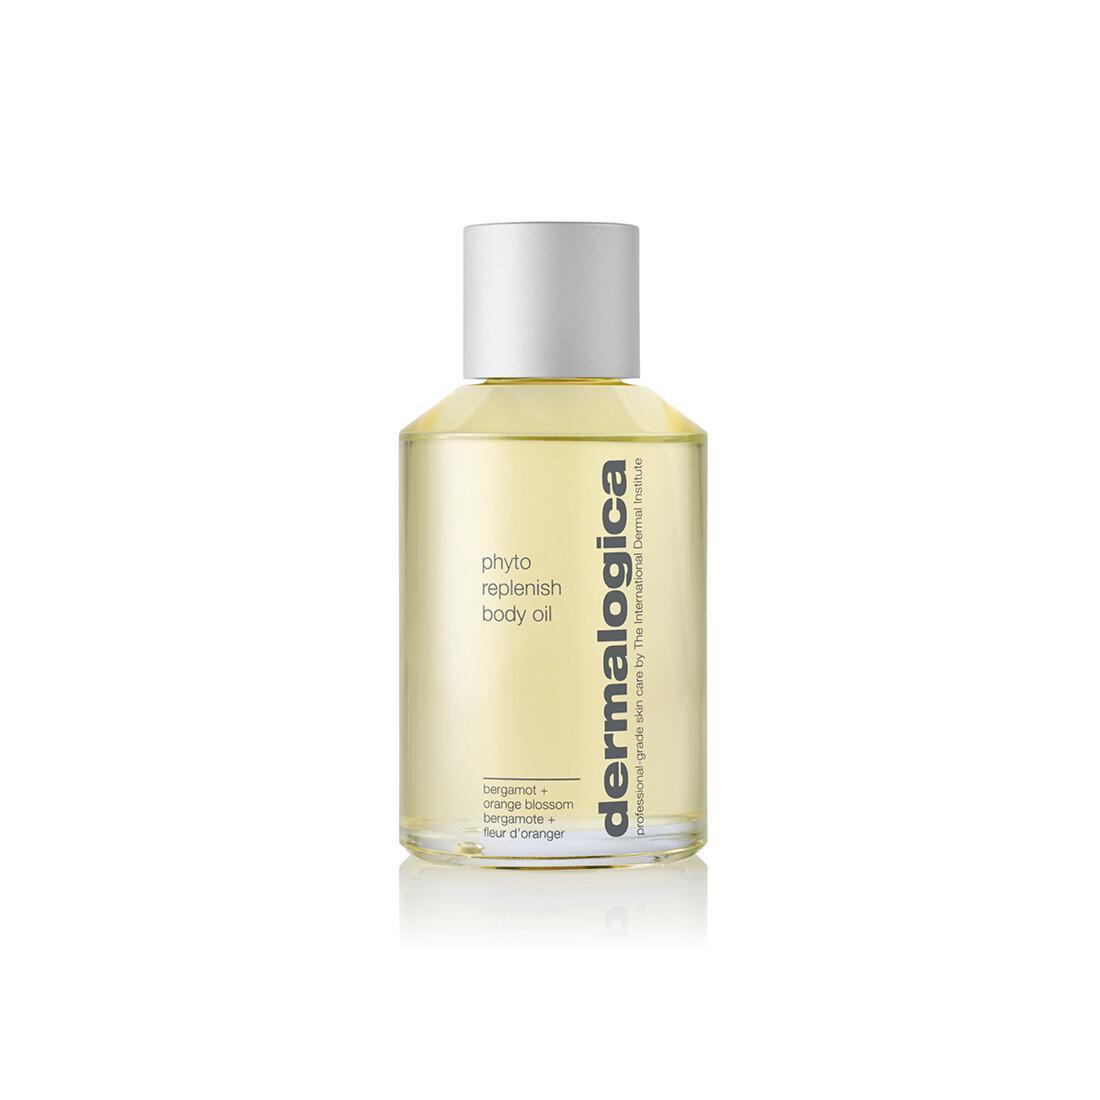 dermalogica® Phyto Replenish Body Oil 125ml